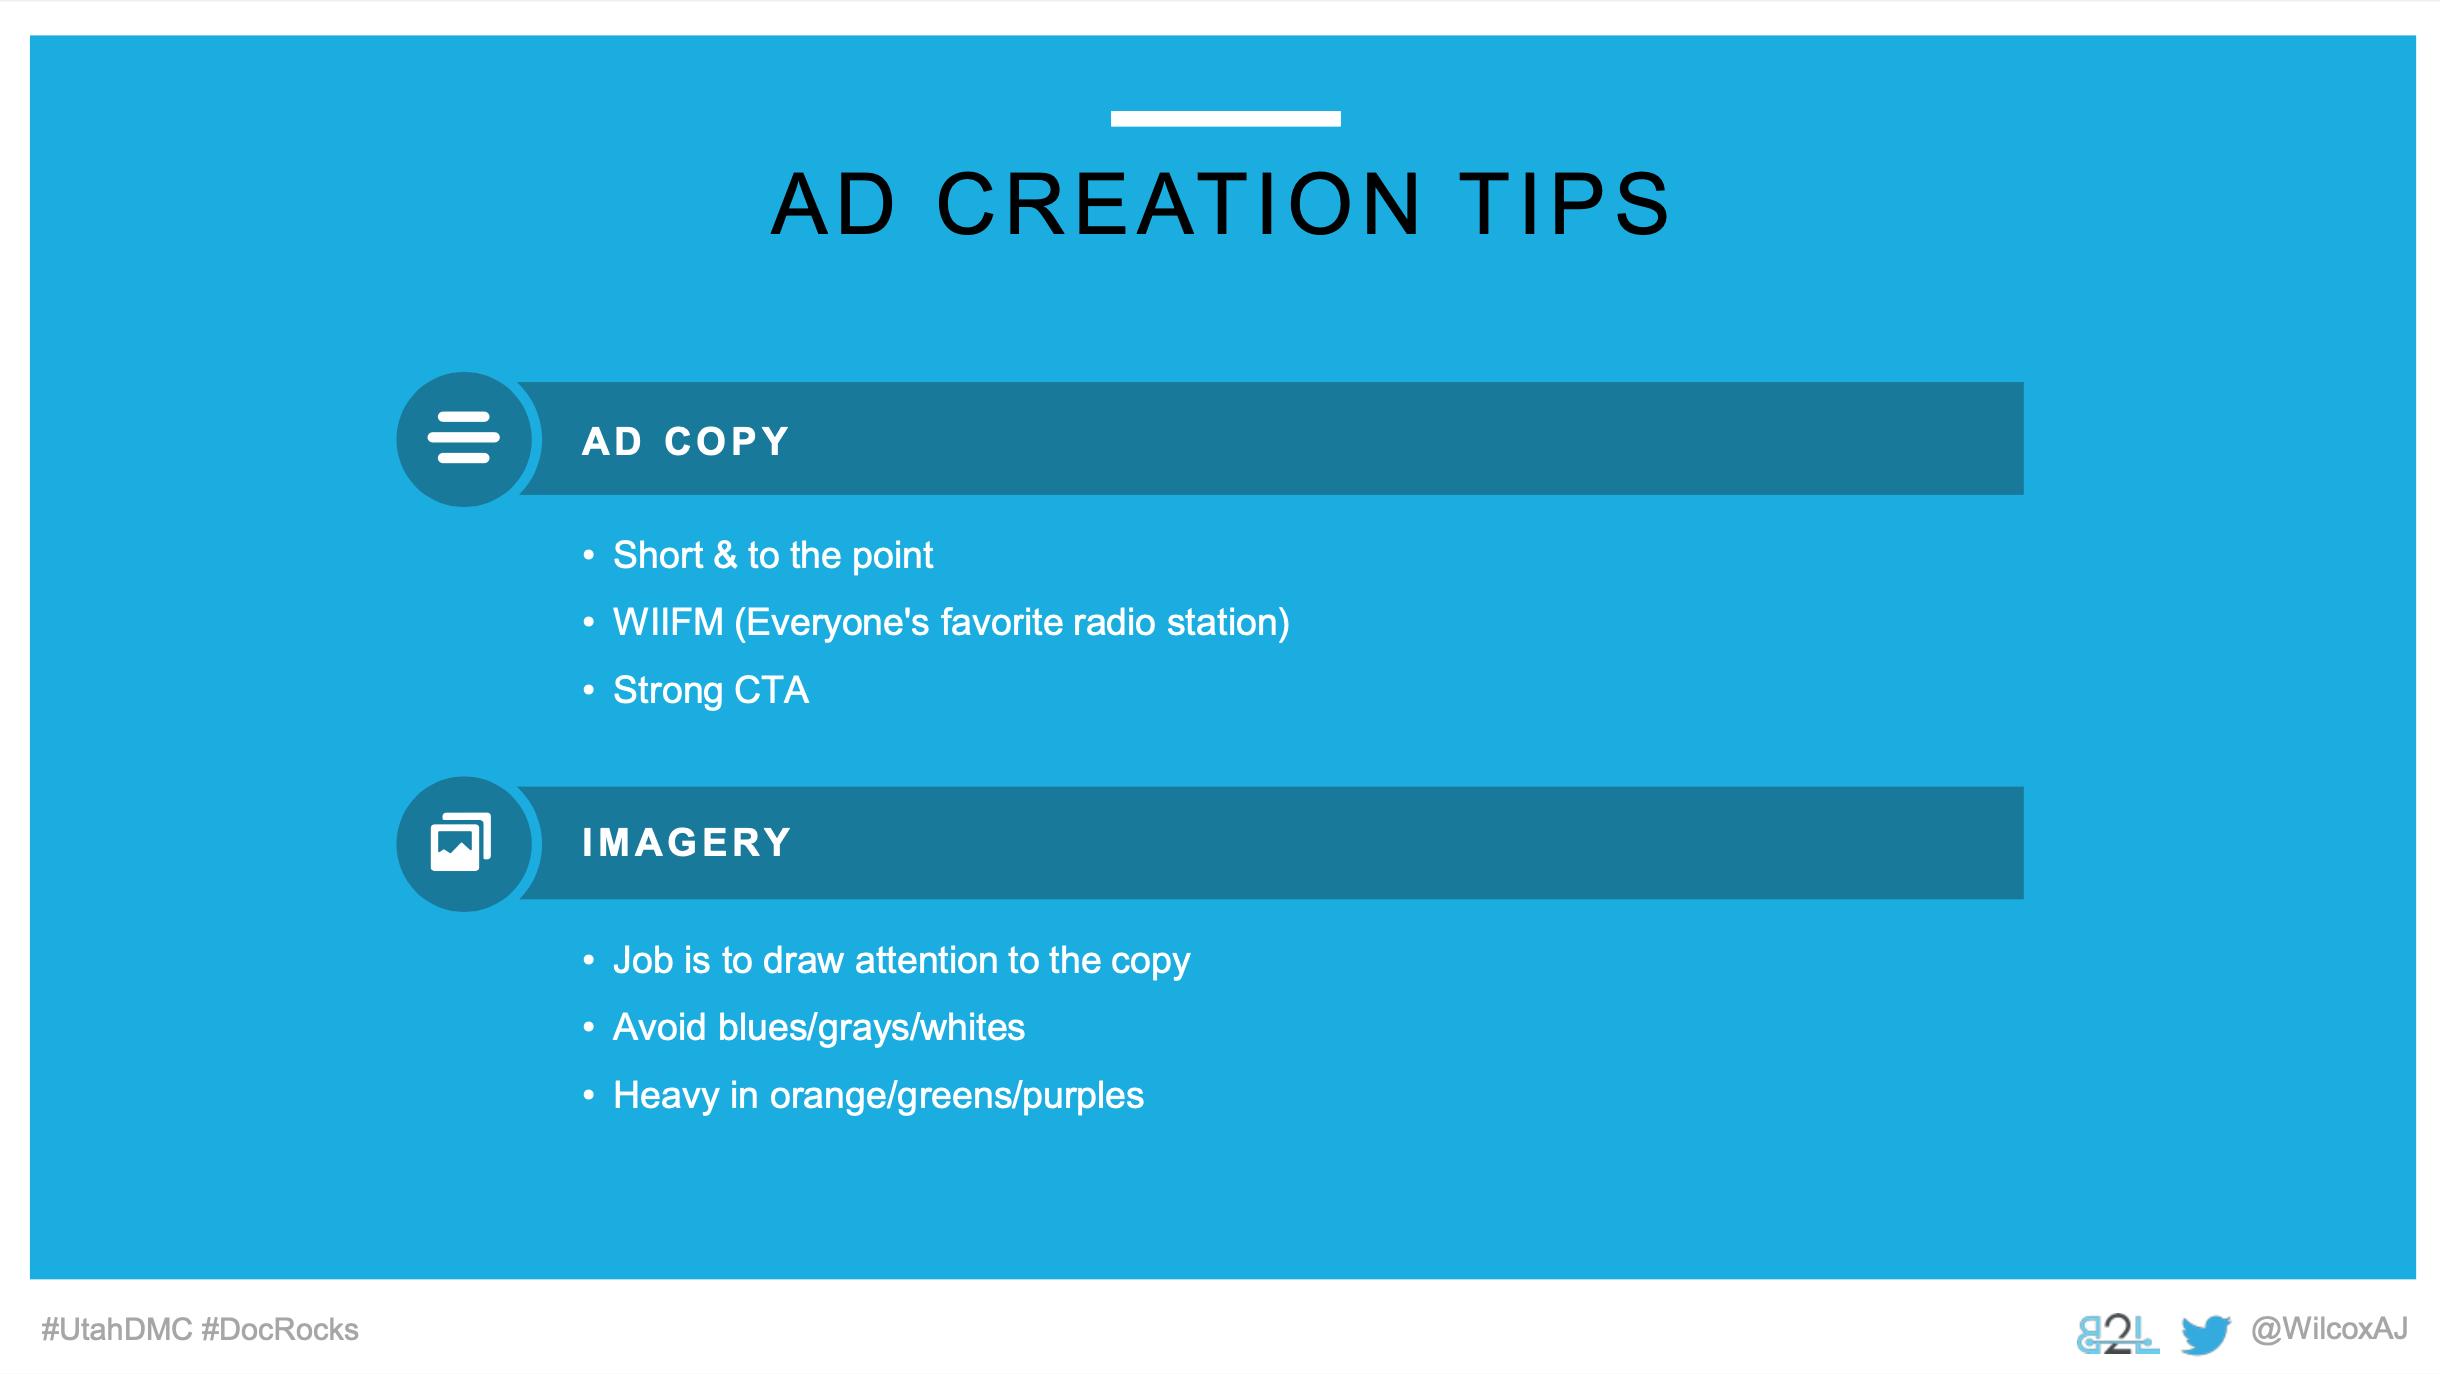 Utah DMC LinkedIn Ads - Aj Wilcox - Ad Units - Ad Creation Tips